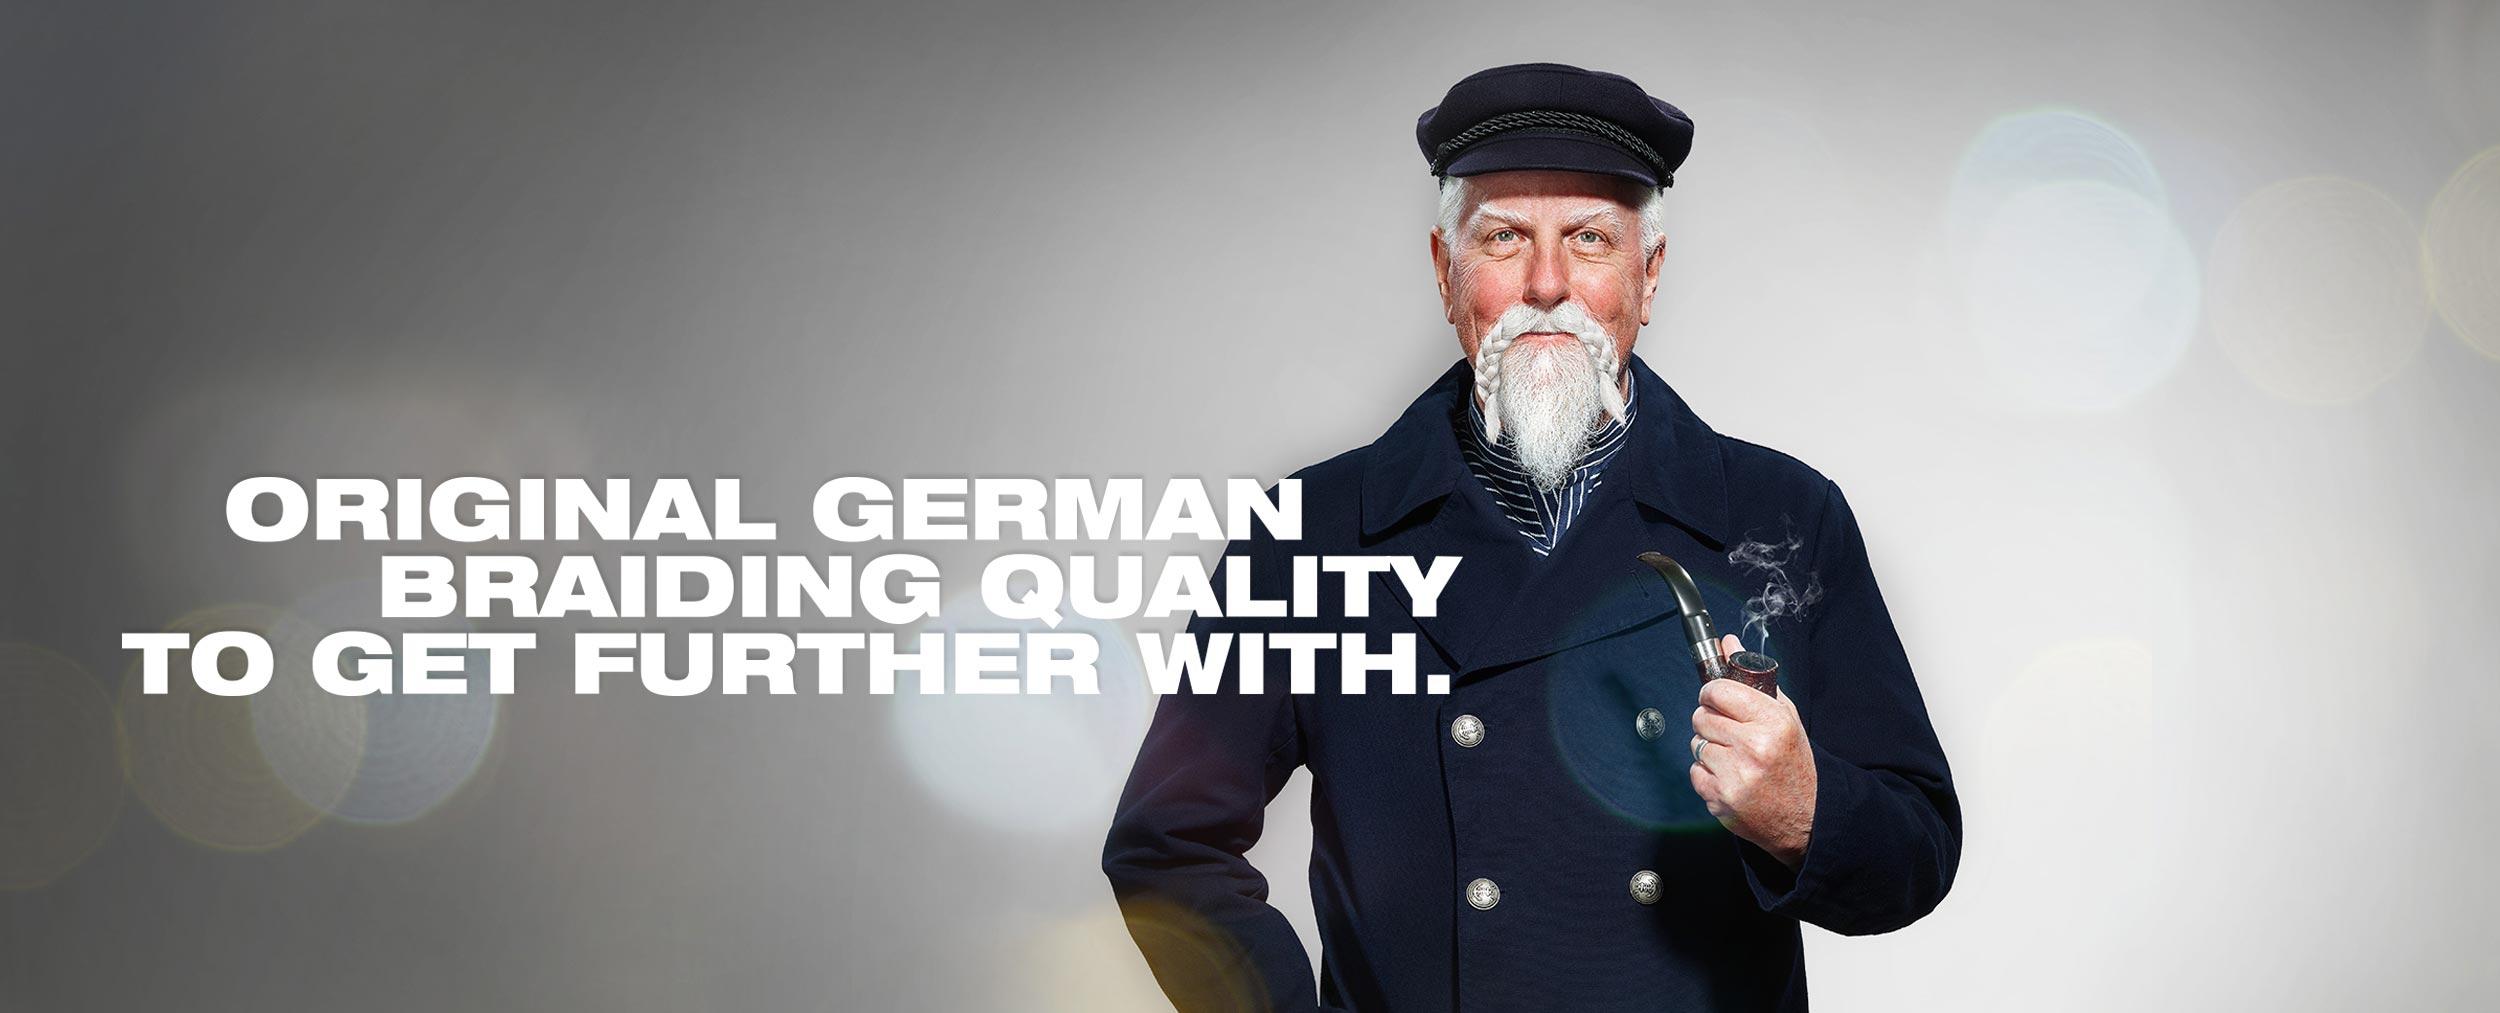 german-braiding-quality-to-get-further-with-herzog